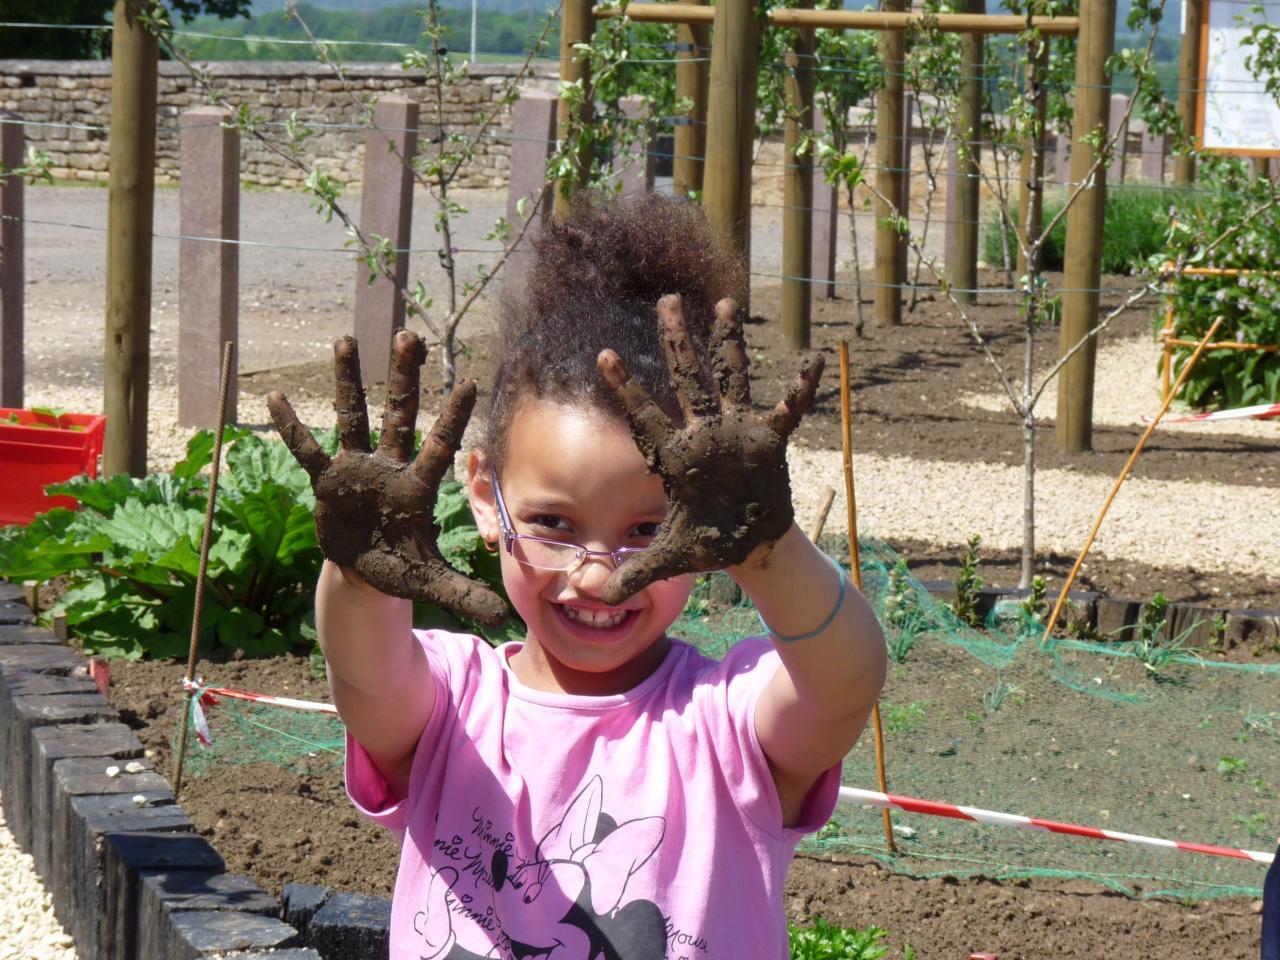 les joies du jardinnage